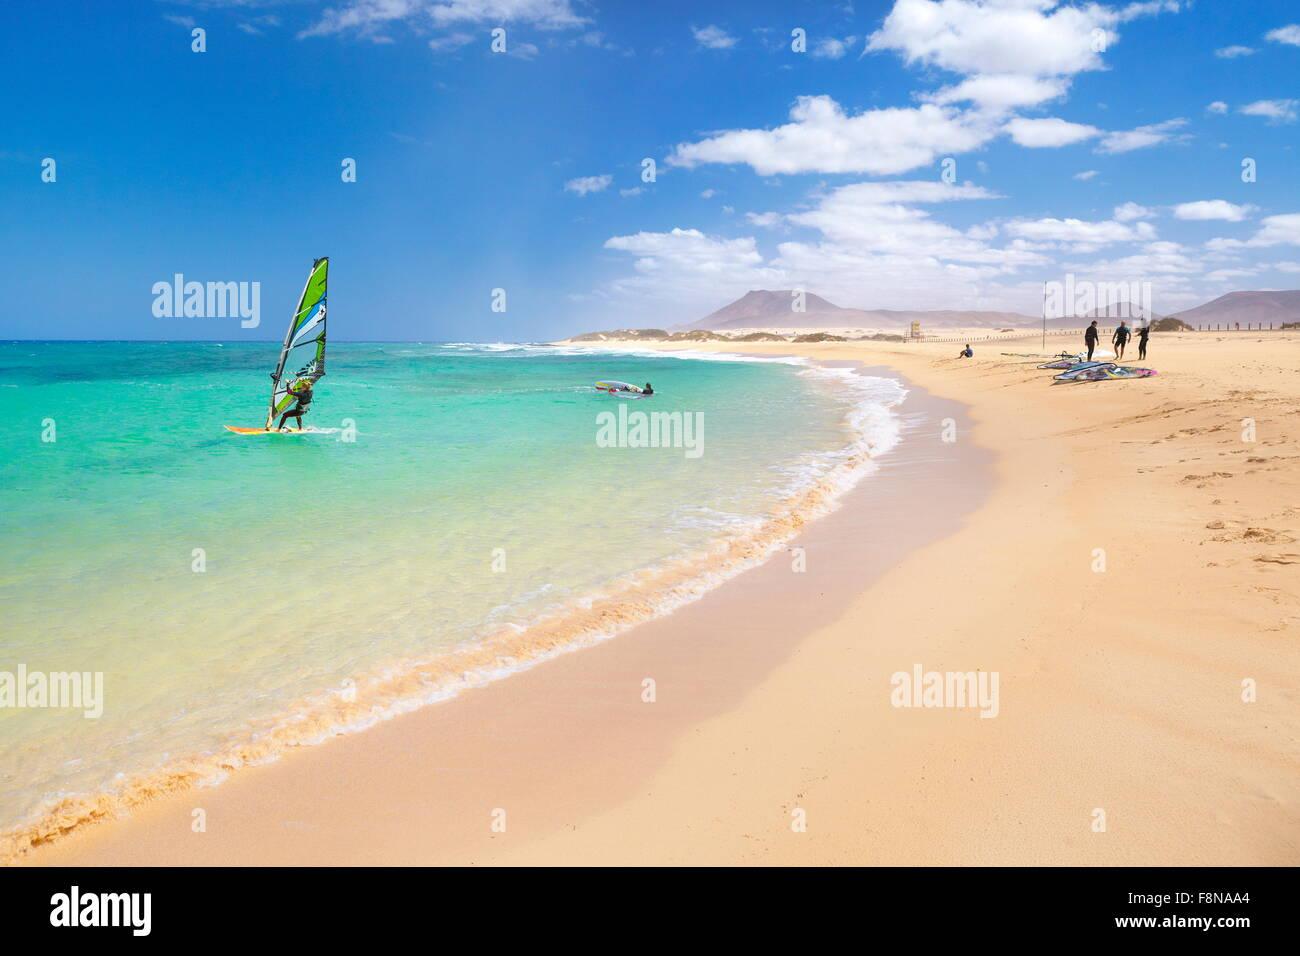 Canary Beach at Fuerteventura Island, windsurfing near Corralejo, Canary Islands, Spain - Stock Image